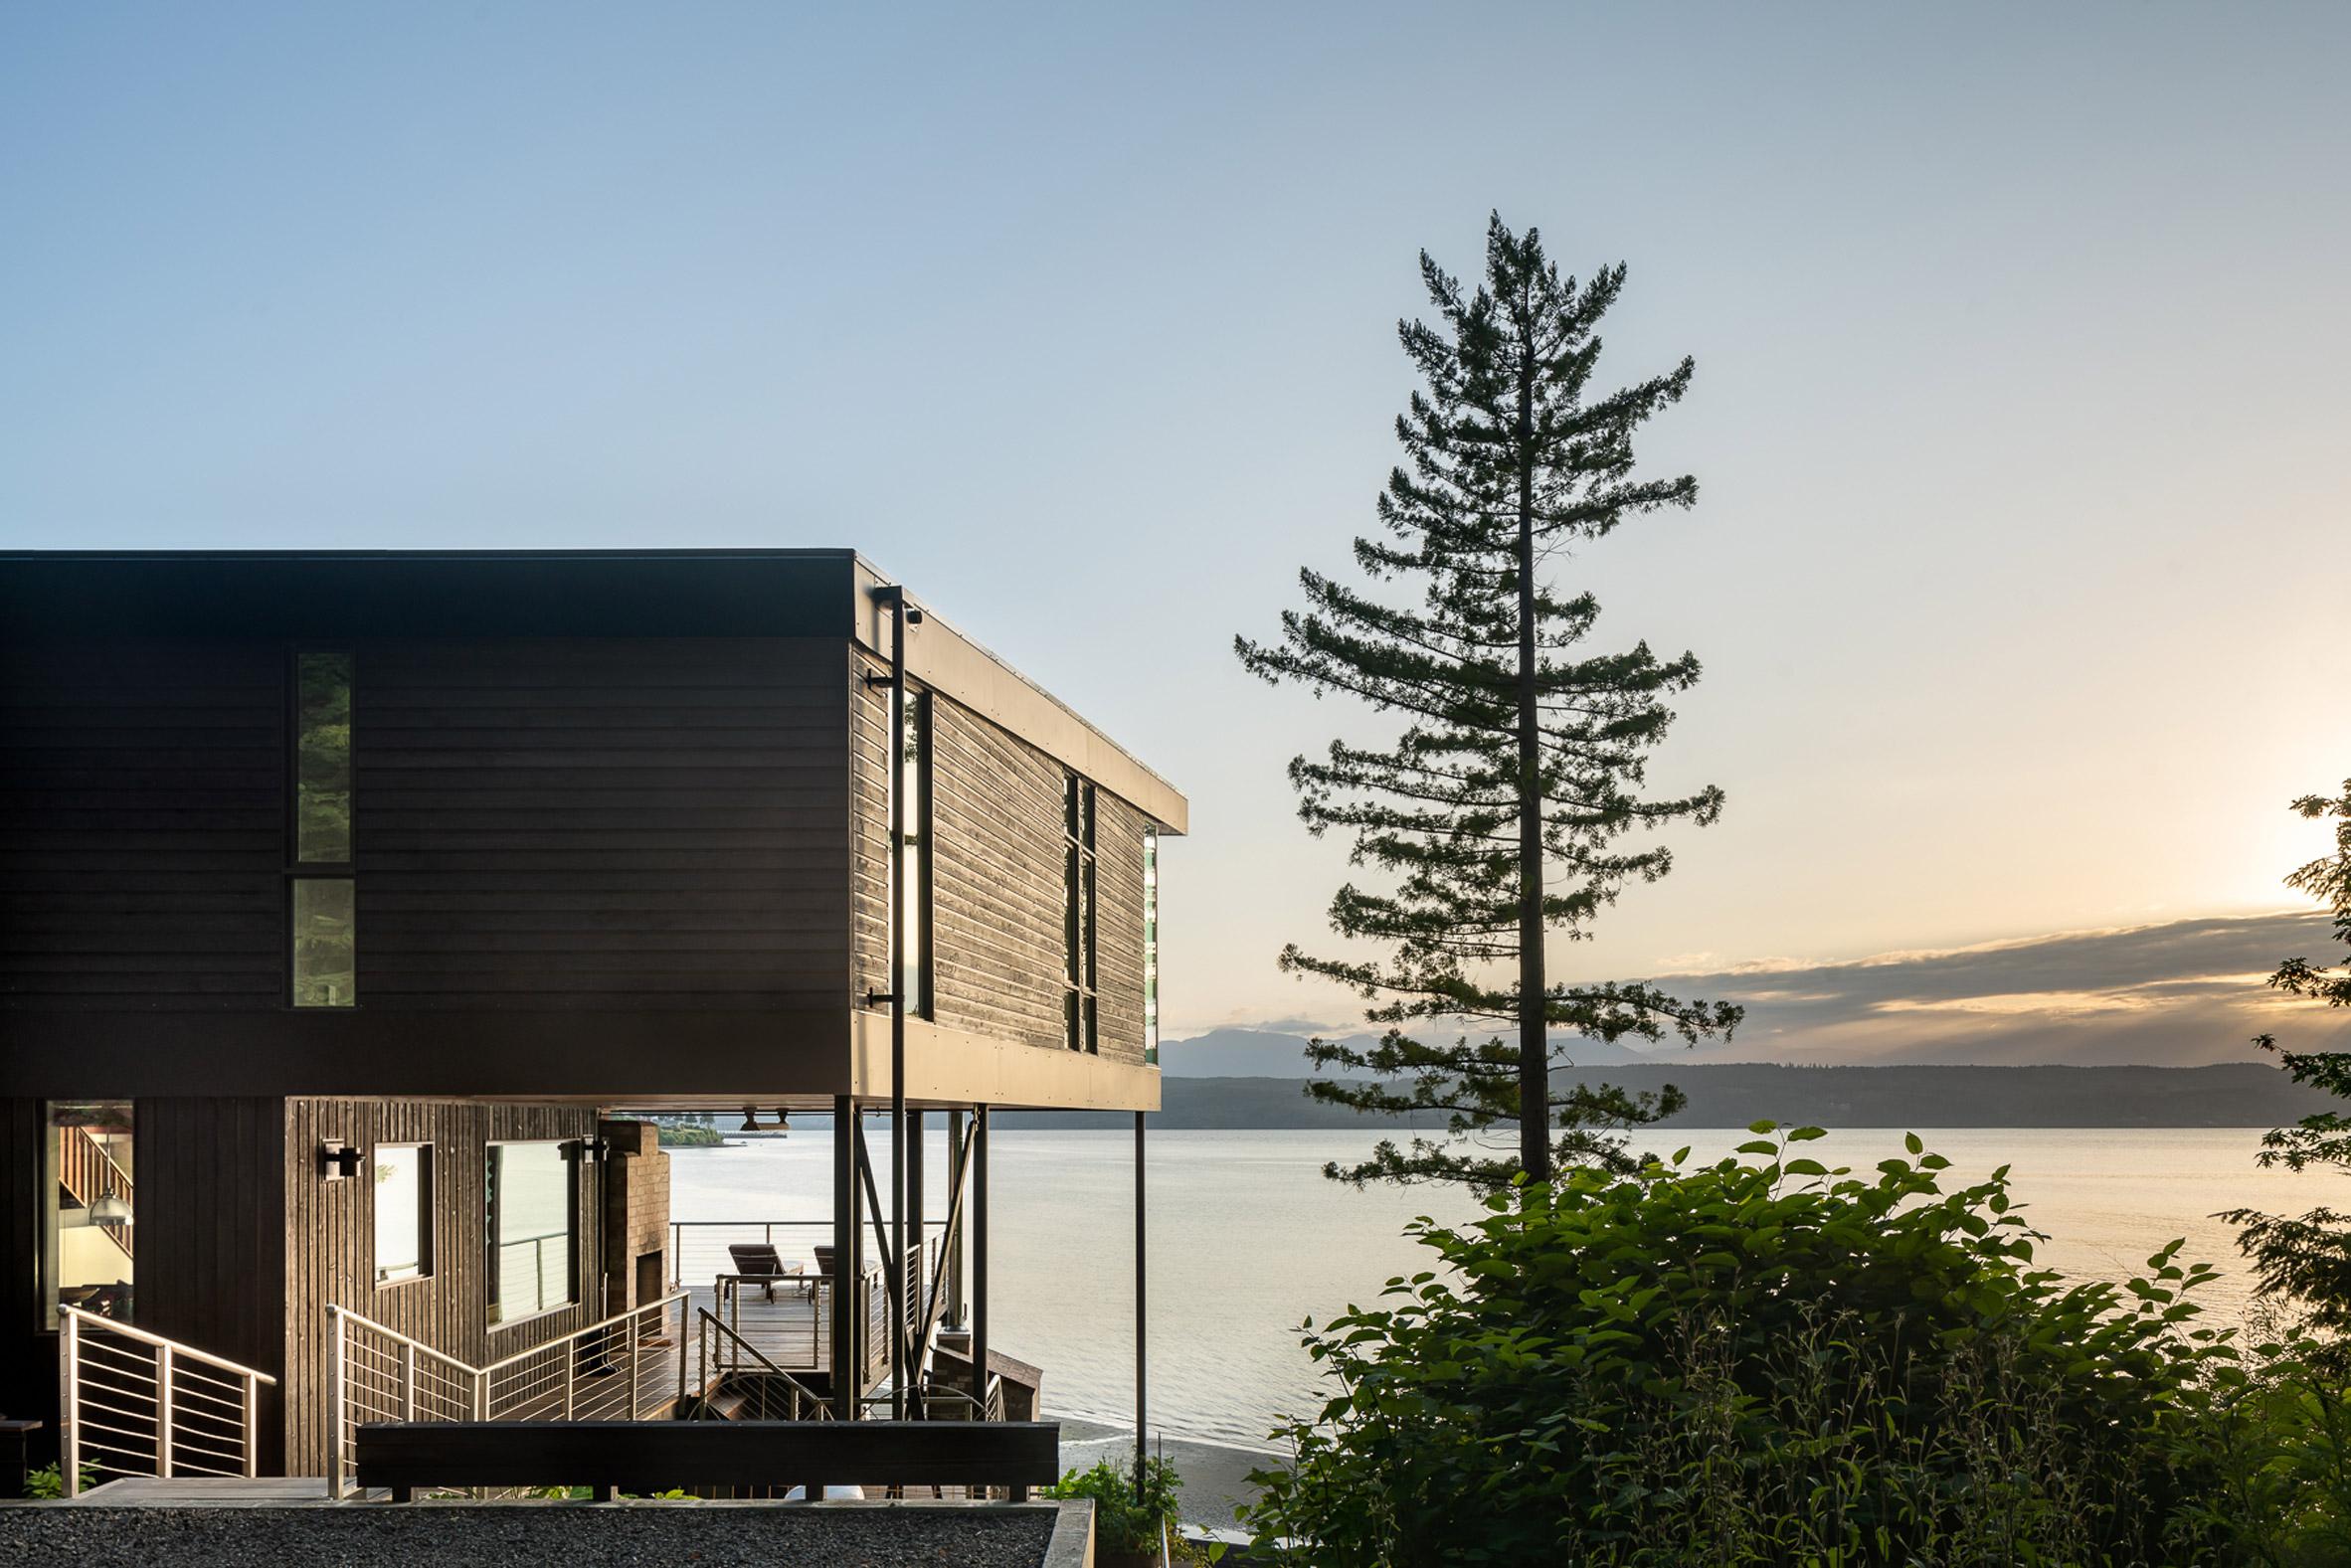 Side view of Aldo Beach House